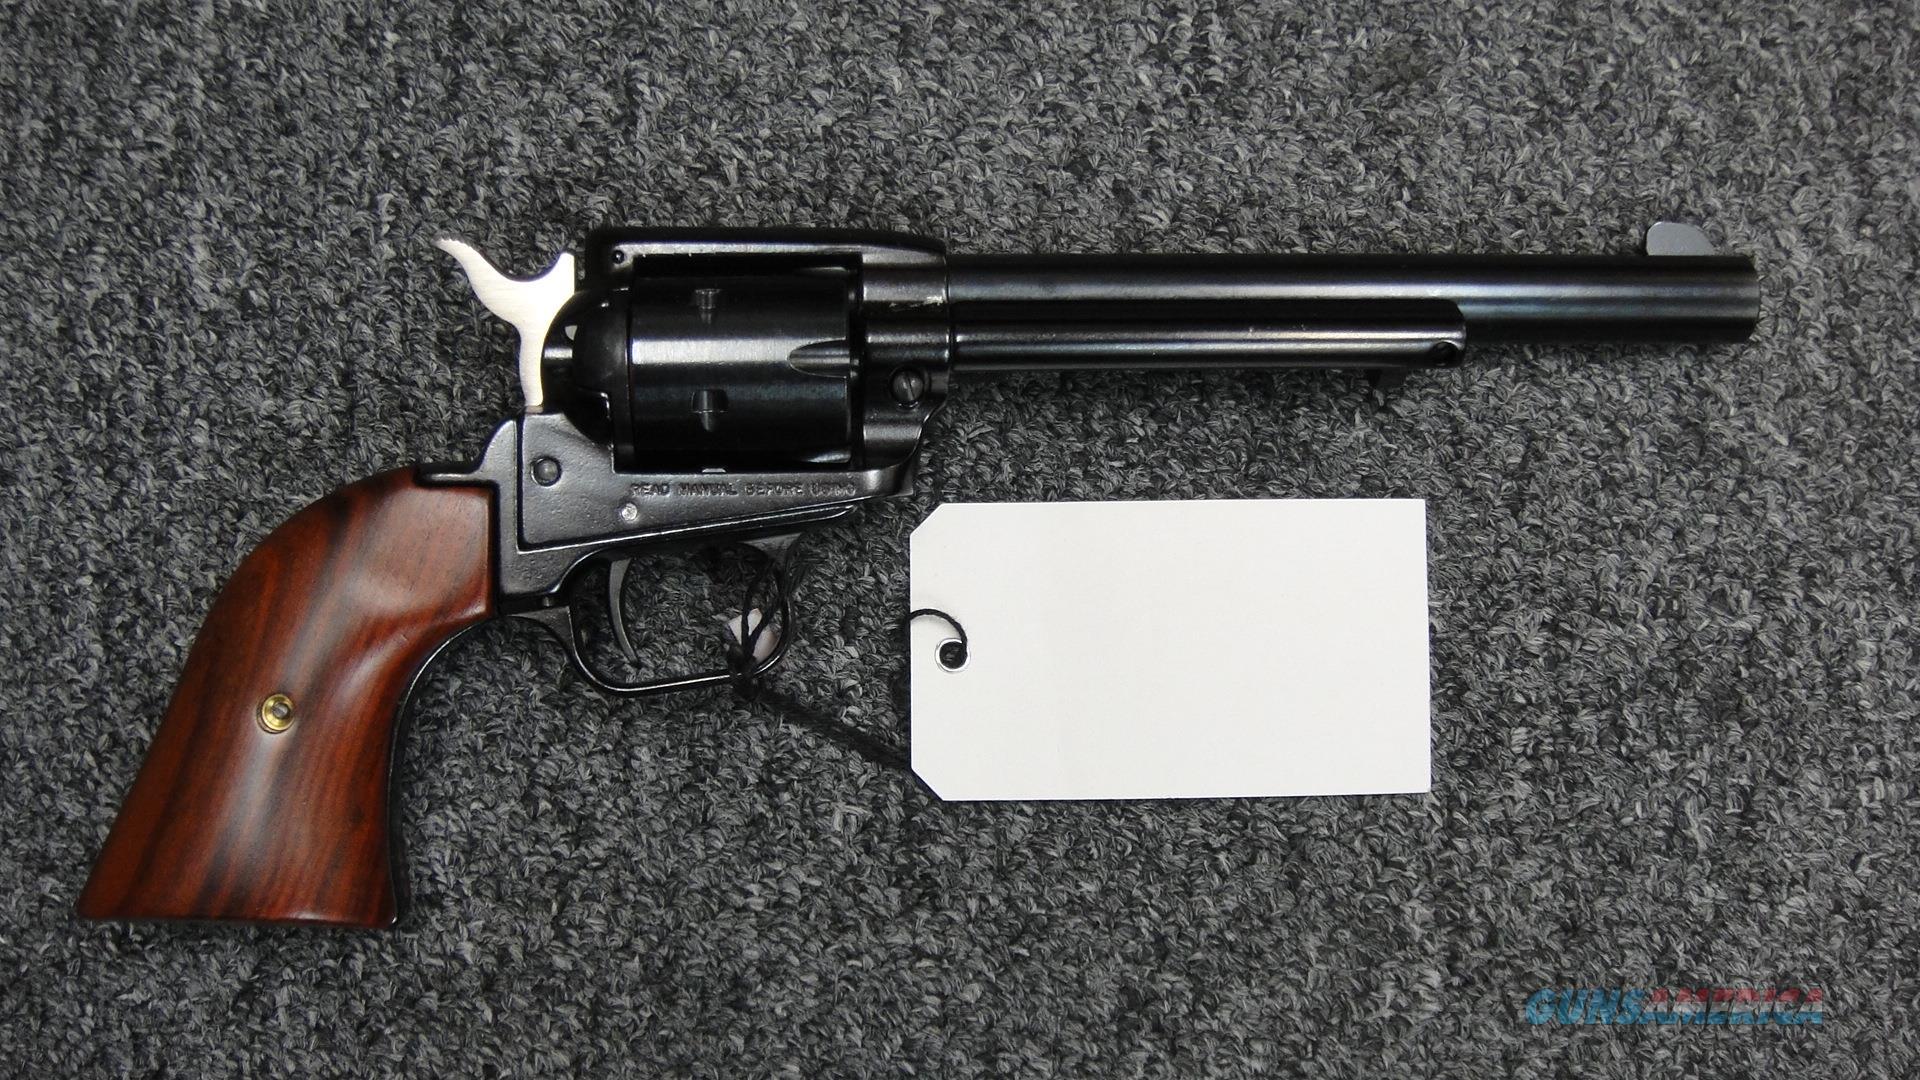 Heritage Mfg Rough Rider SAO revolver .22LR  Guns > Pistols > Heritage